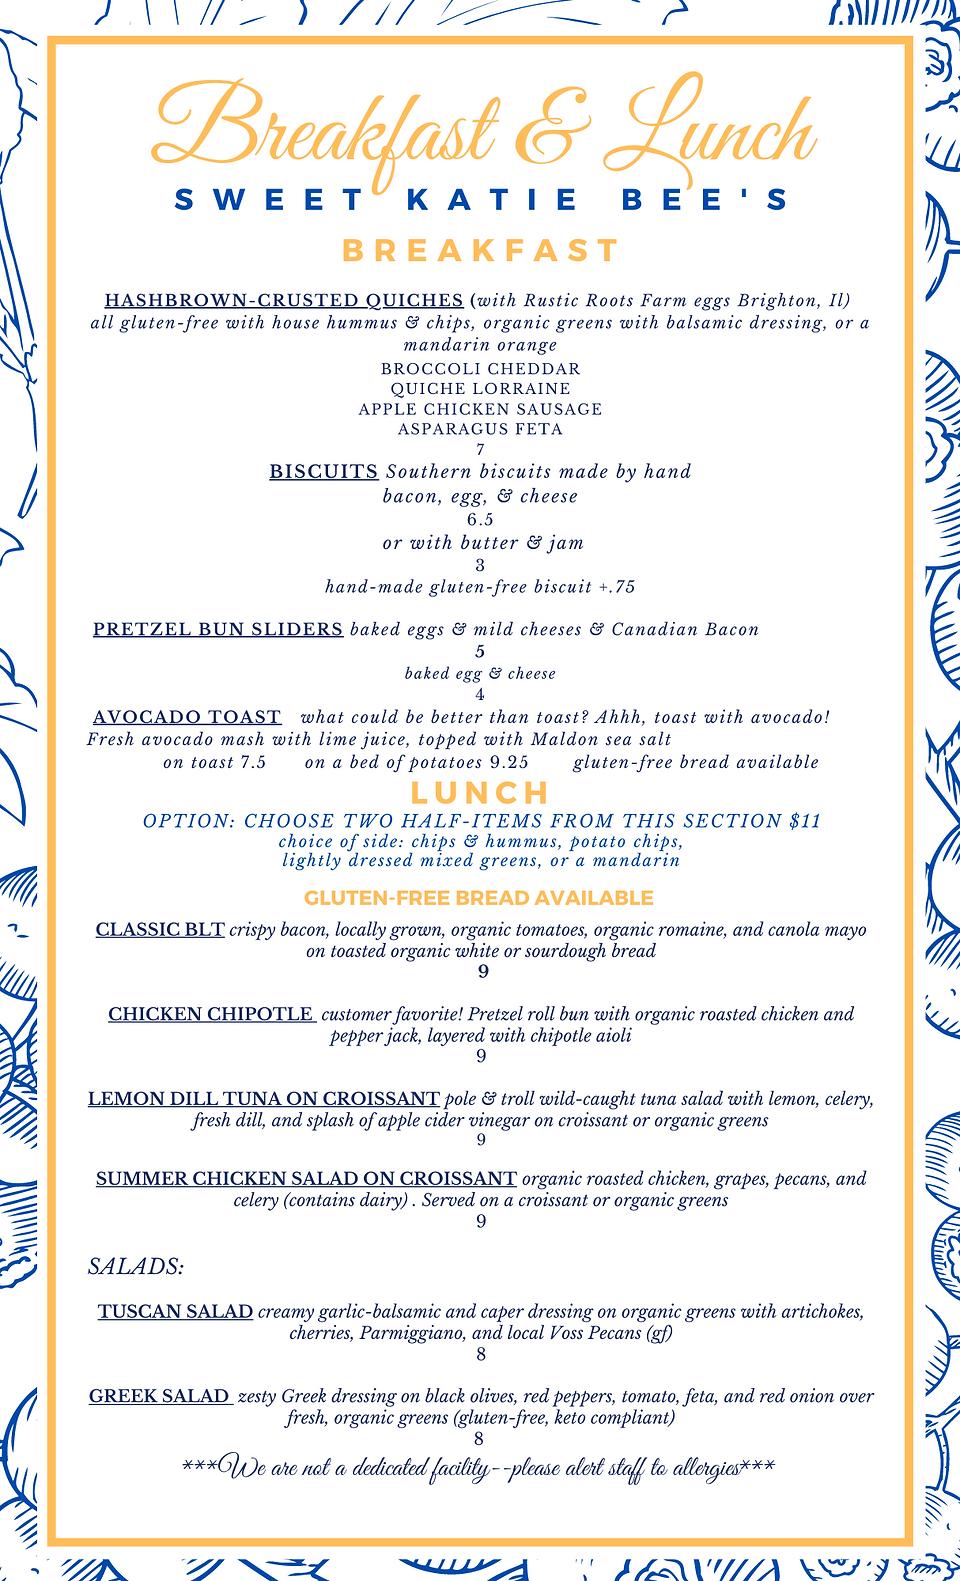 skb brekky & lunch menu 9.2.21 .png